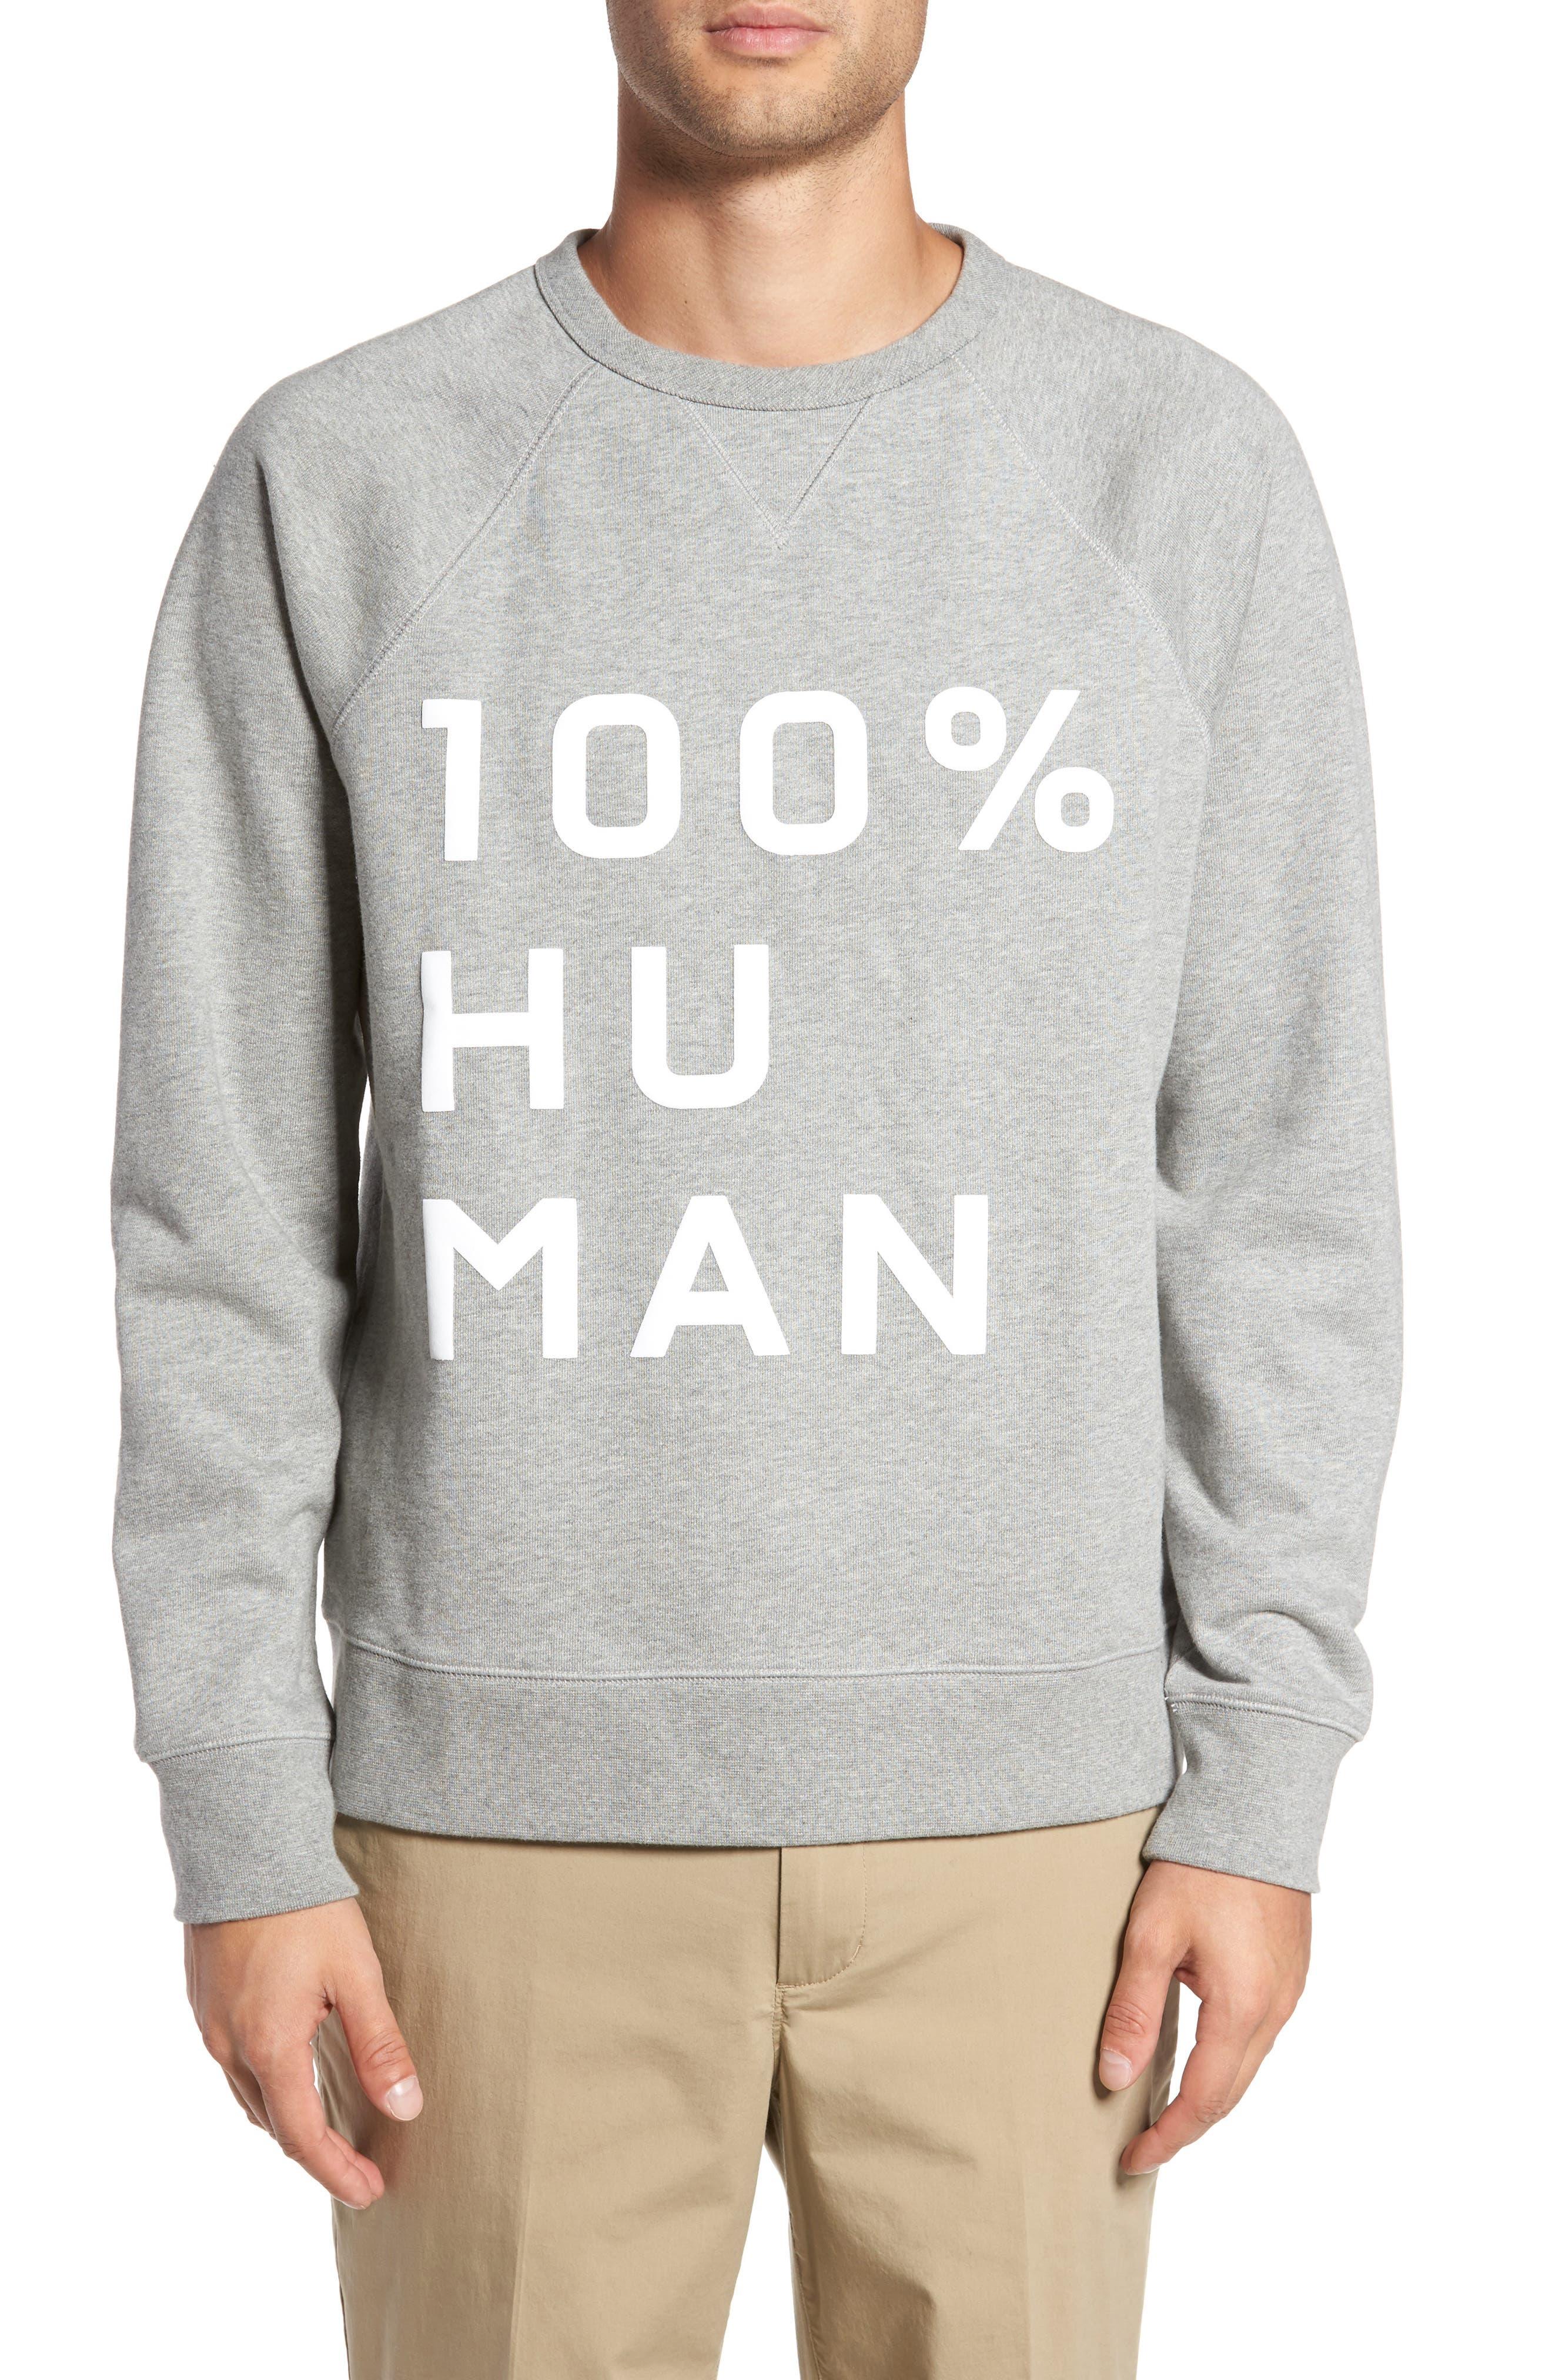 Alternate Image 1 Selected - Everlane The 100% Human Unisex French Terry Sweatshirt